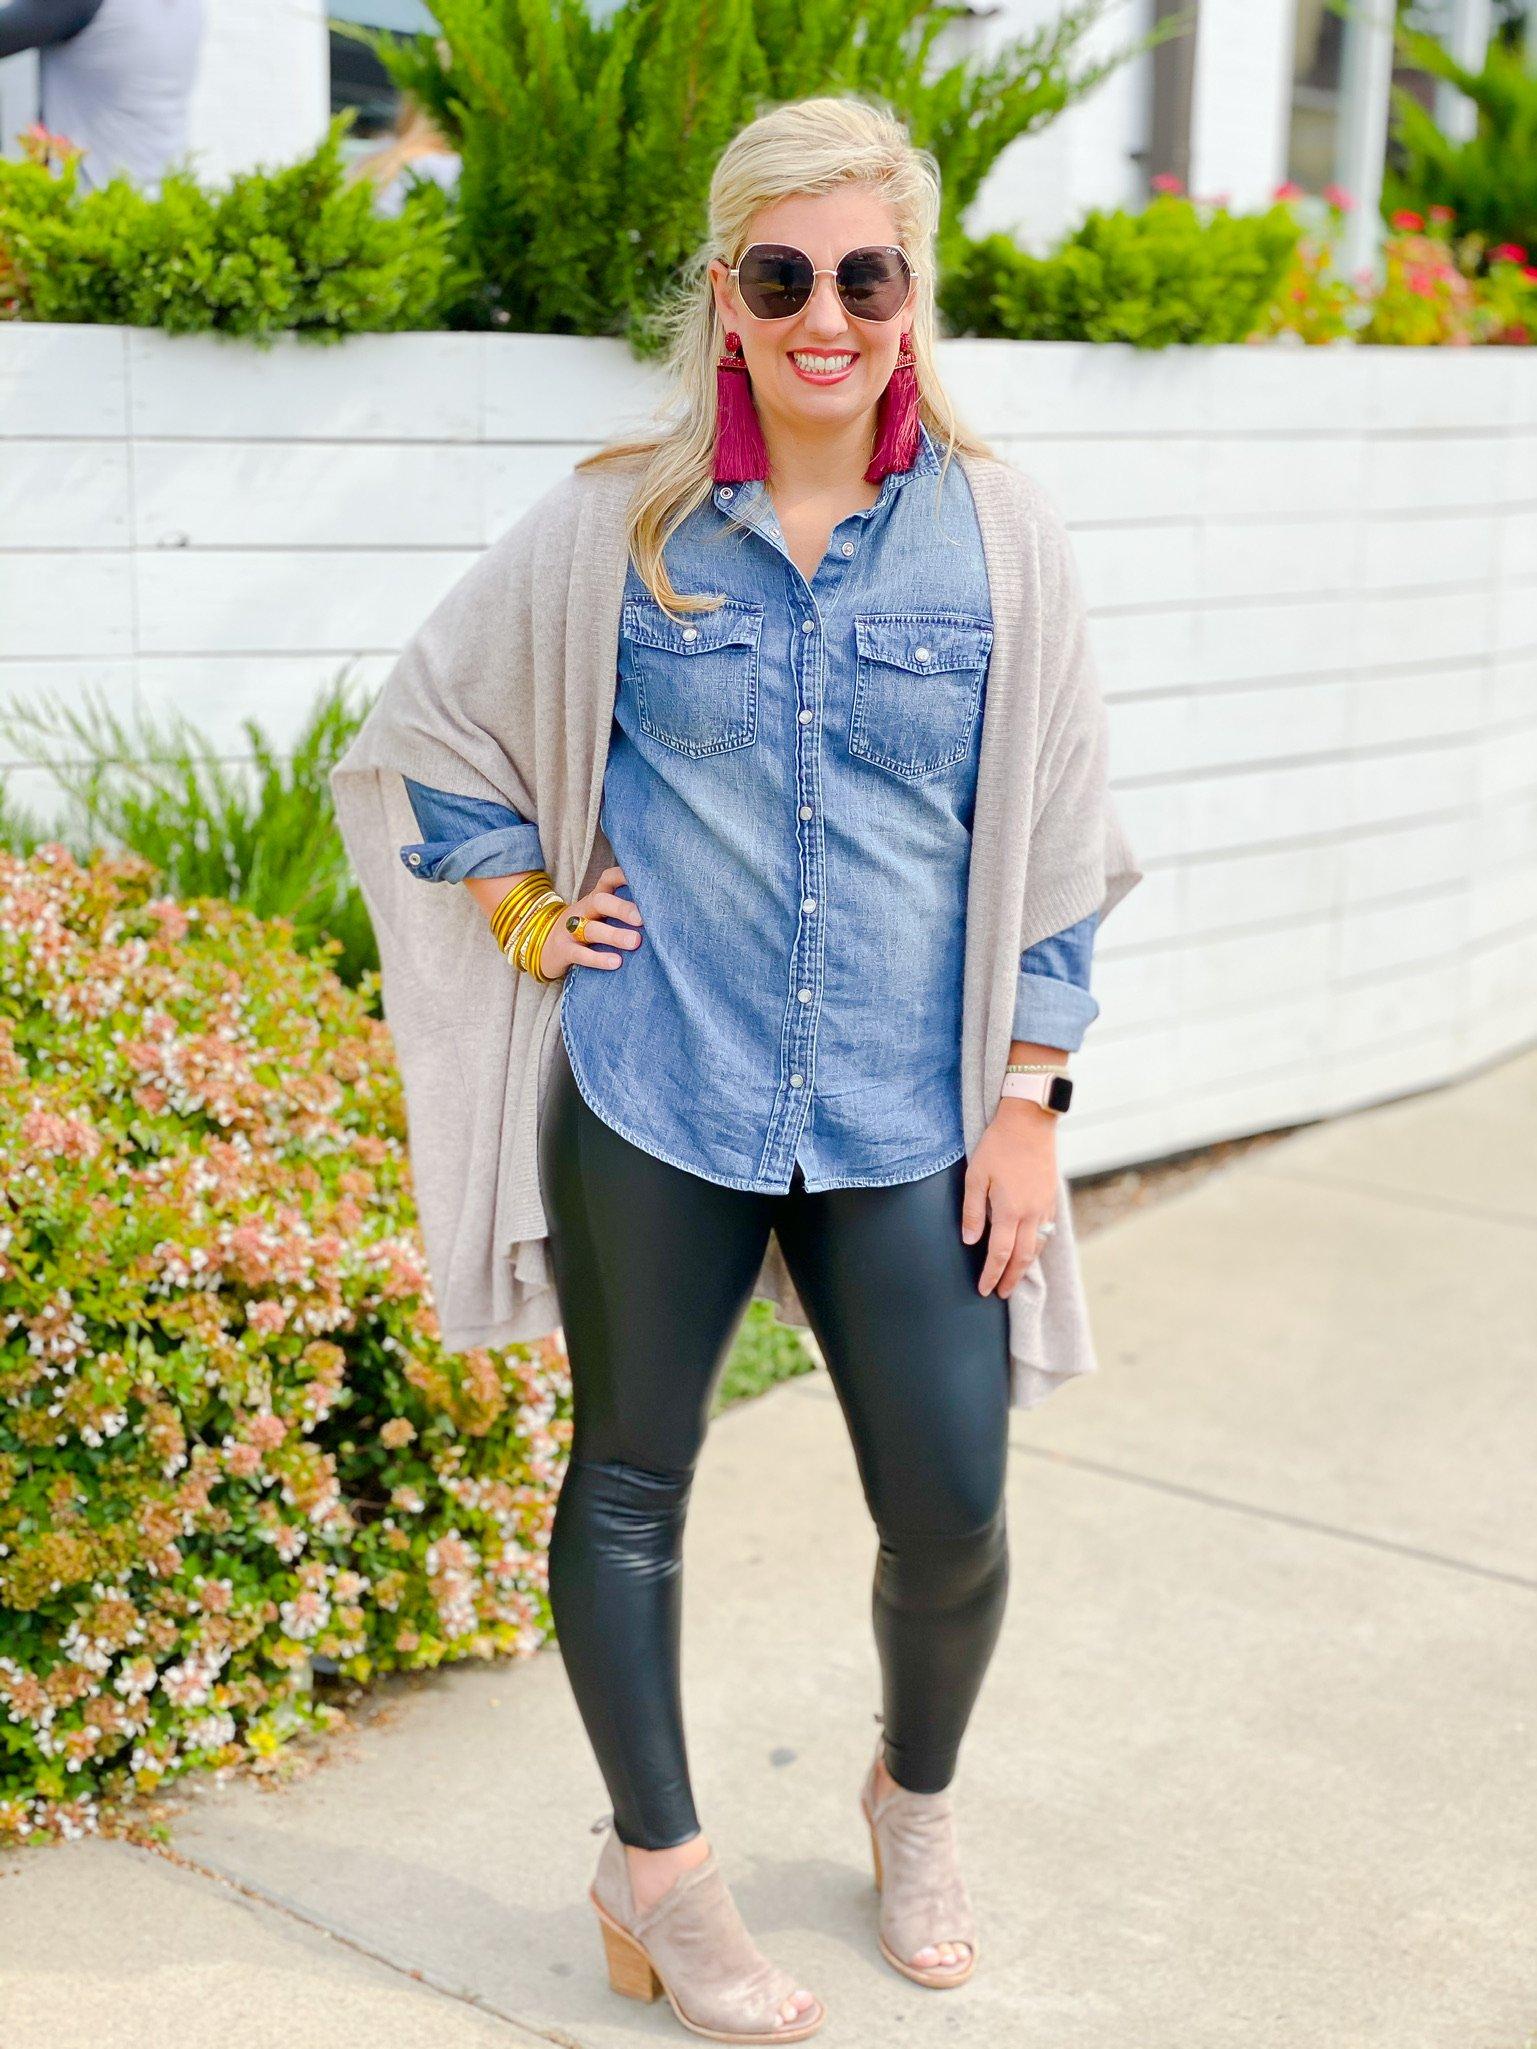 denim top with cardigan and leggings